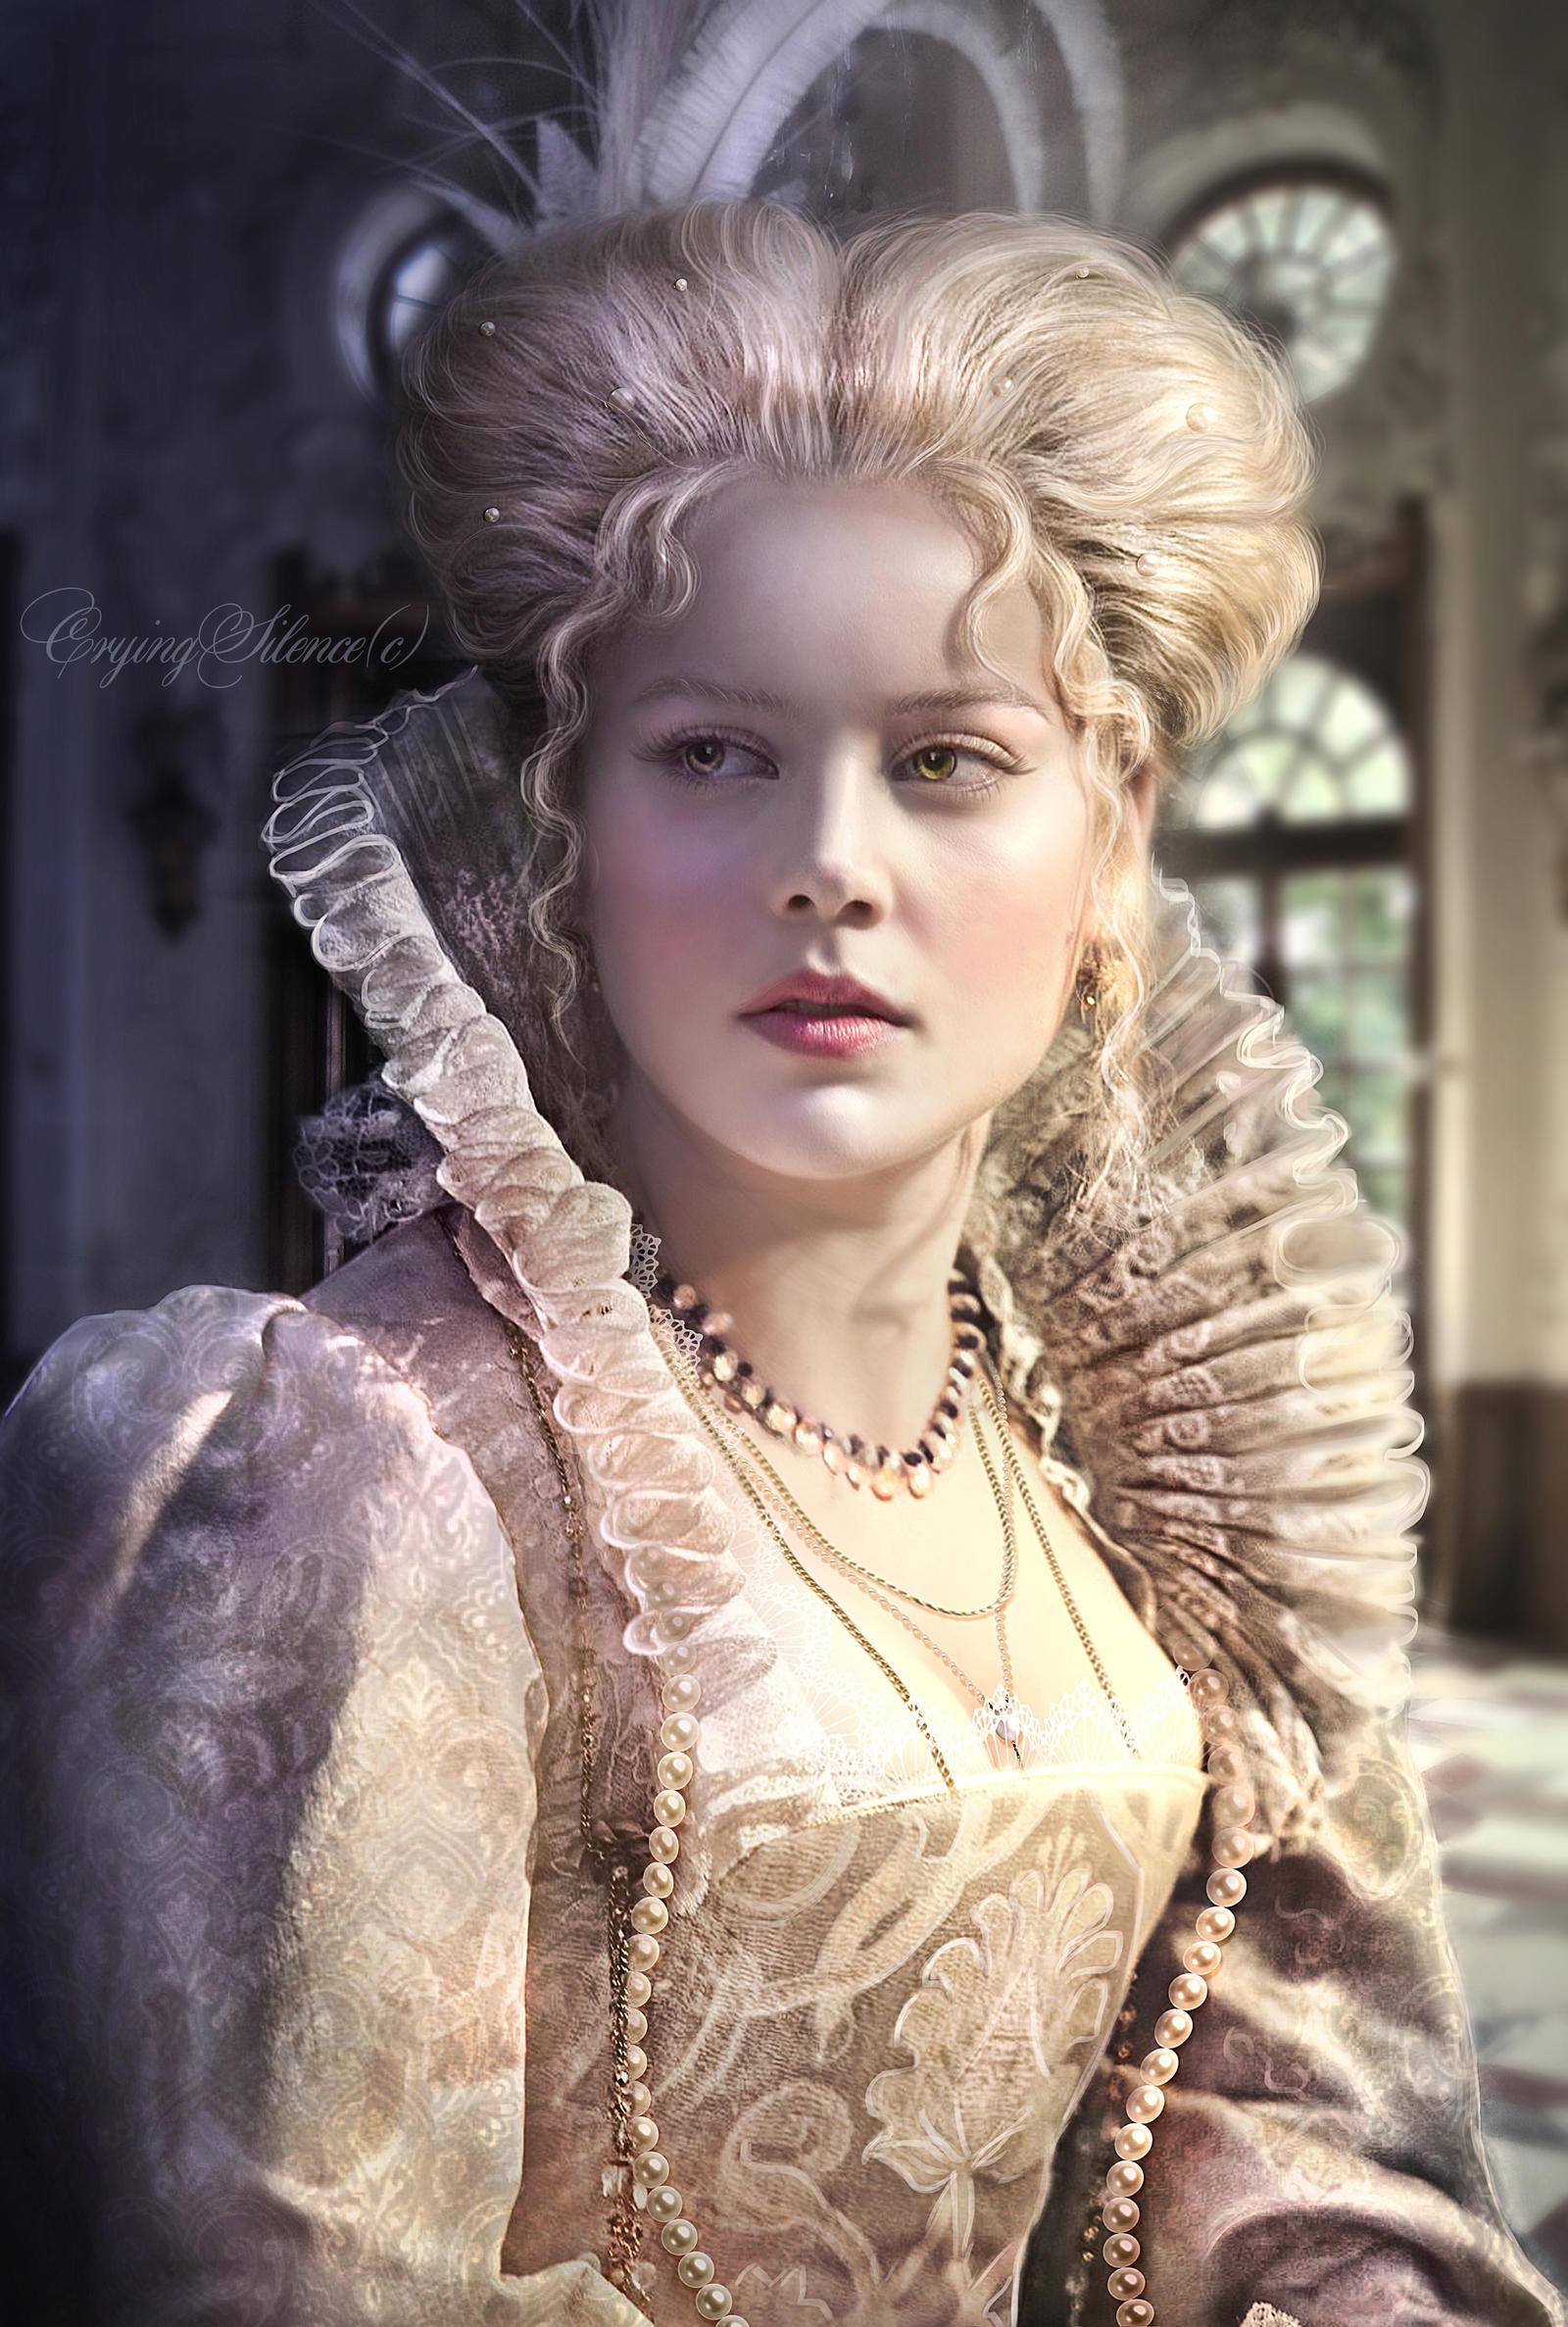 http://img15.deviantart.net/c9e8/i/2012/354/b/e/elizabeth__throckmorton__bess__by_josefinacs-d5omww9.jpg